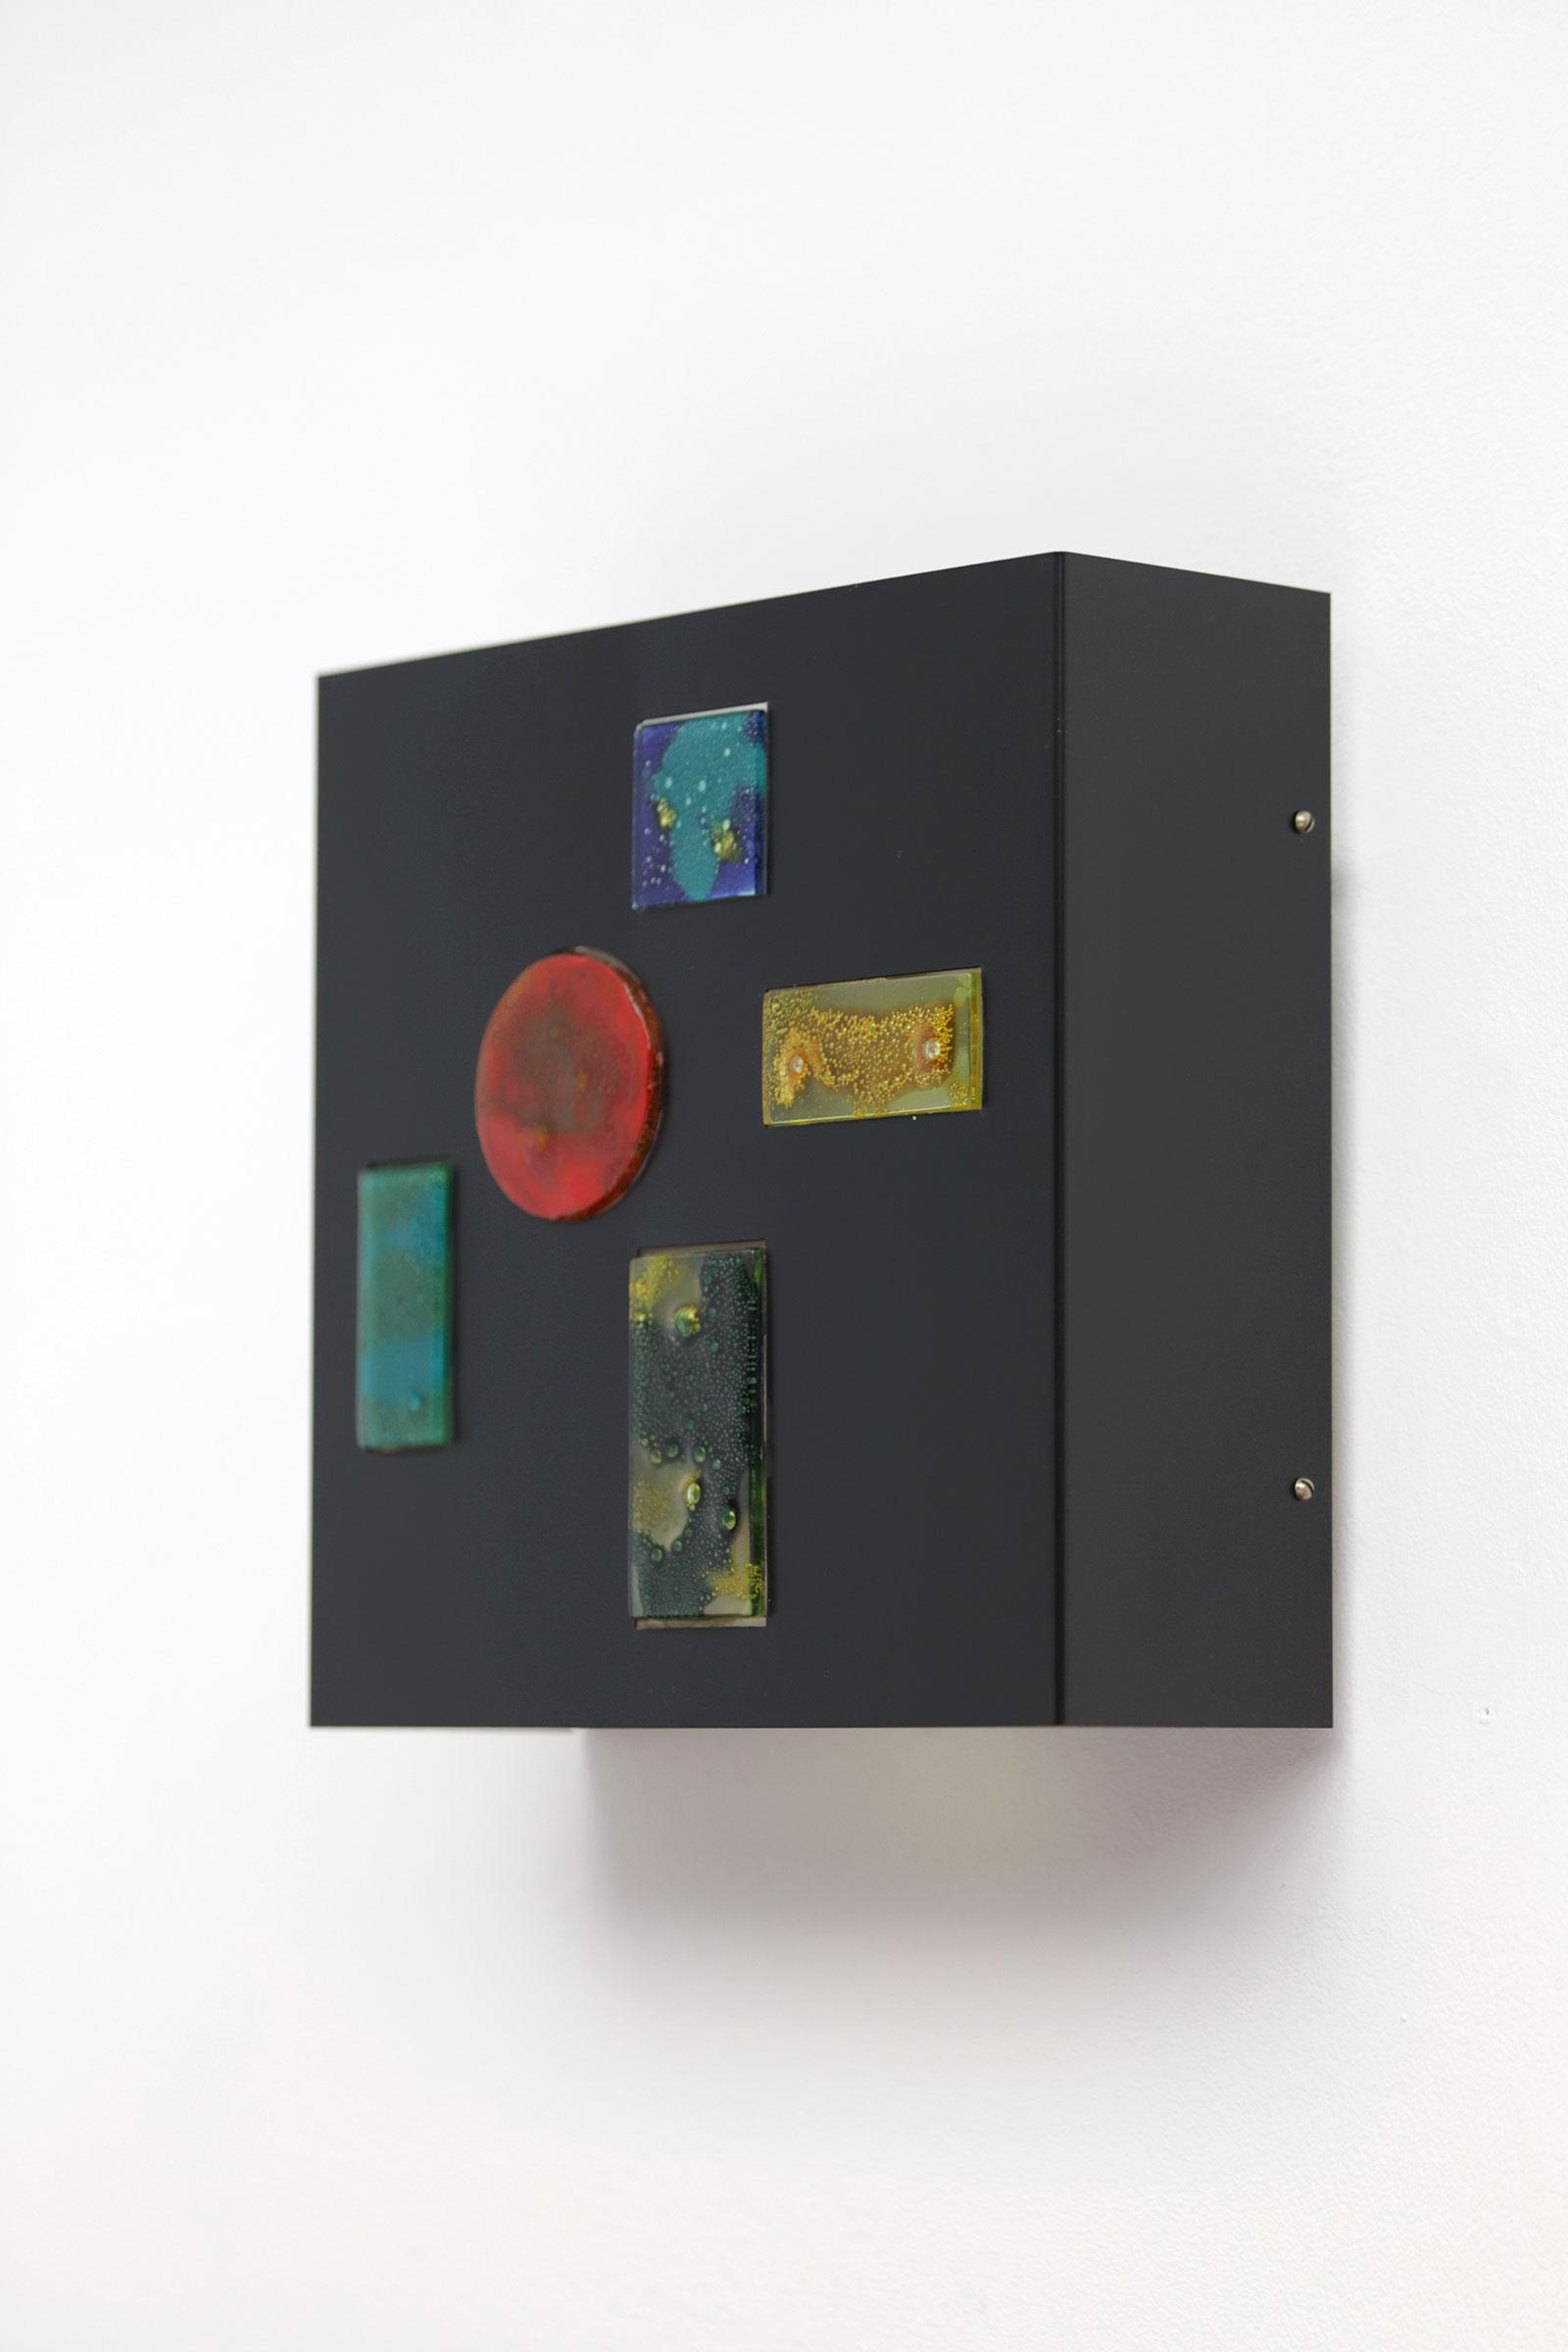 Minimalist wall lamp by Willem van Oyen for Raakimage 4